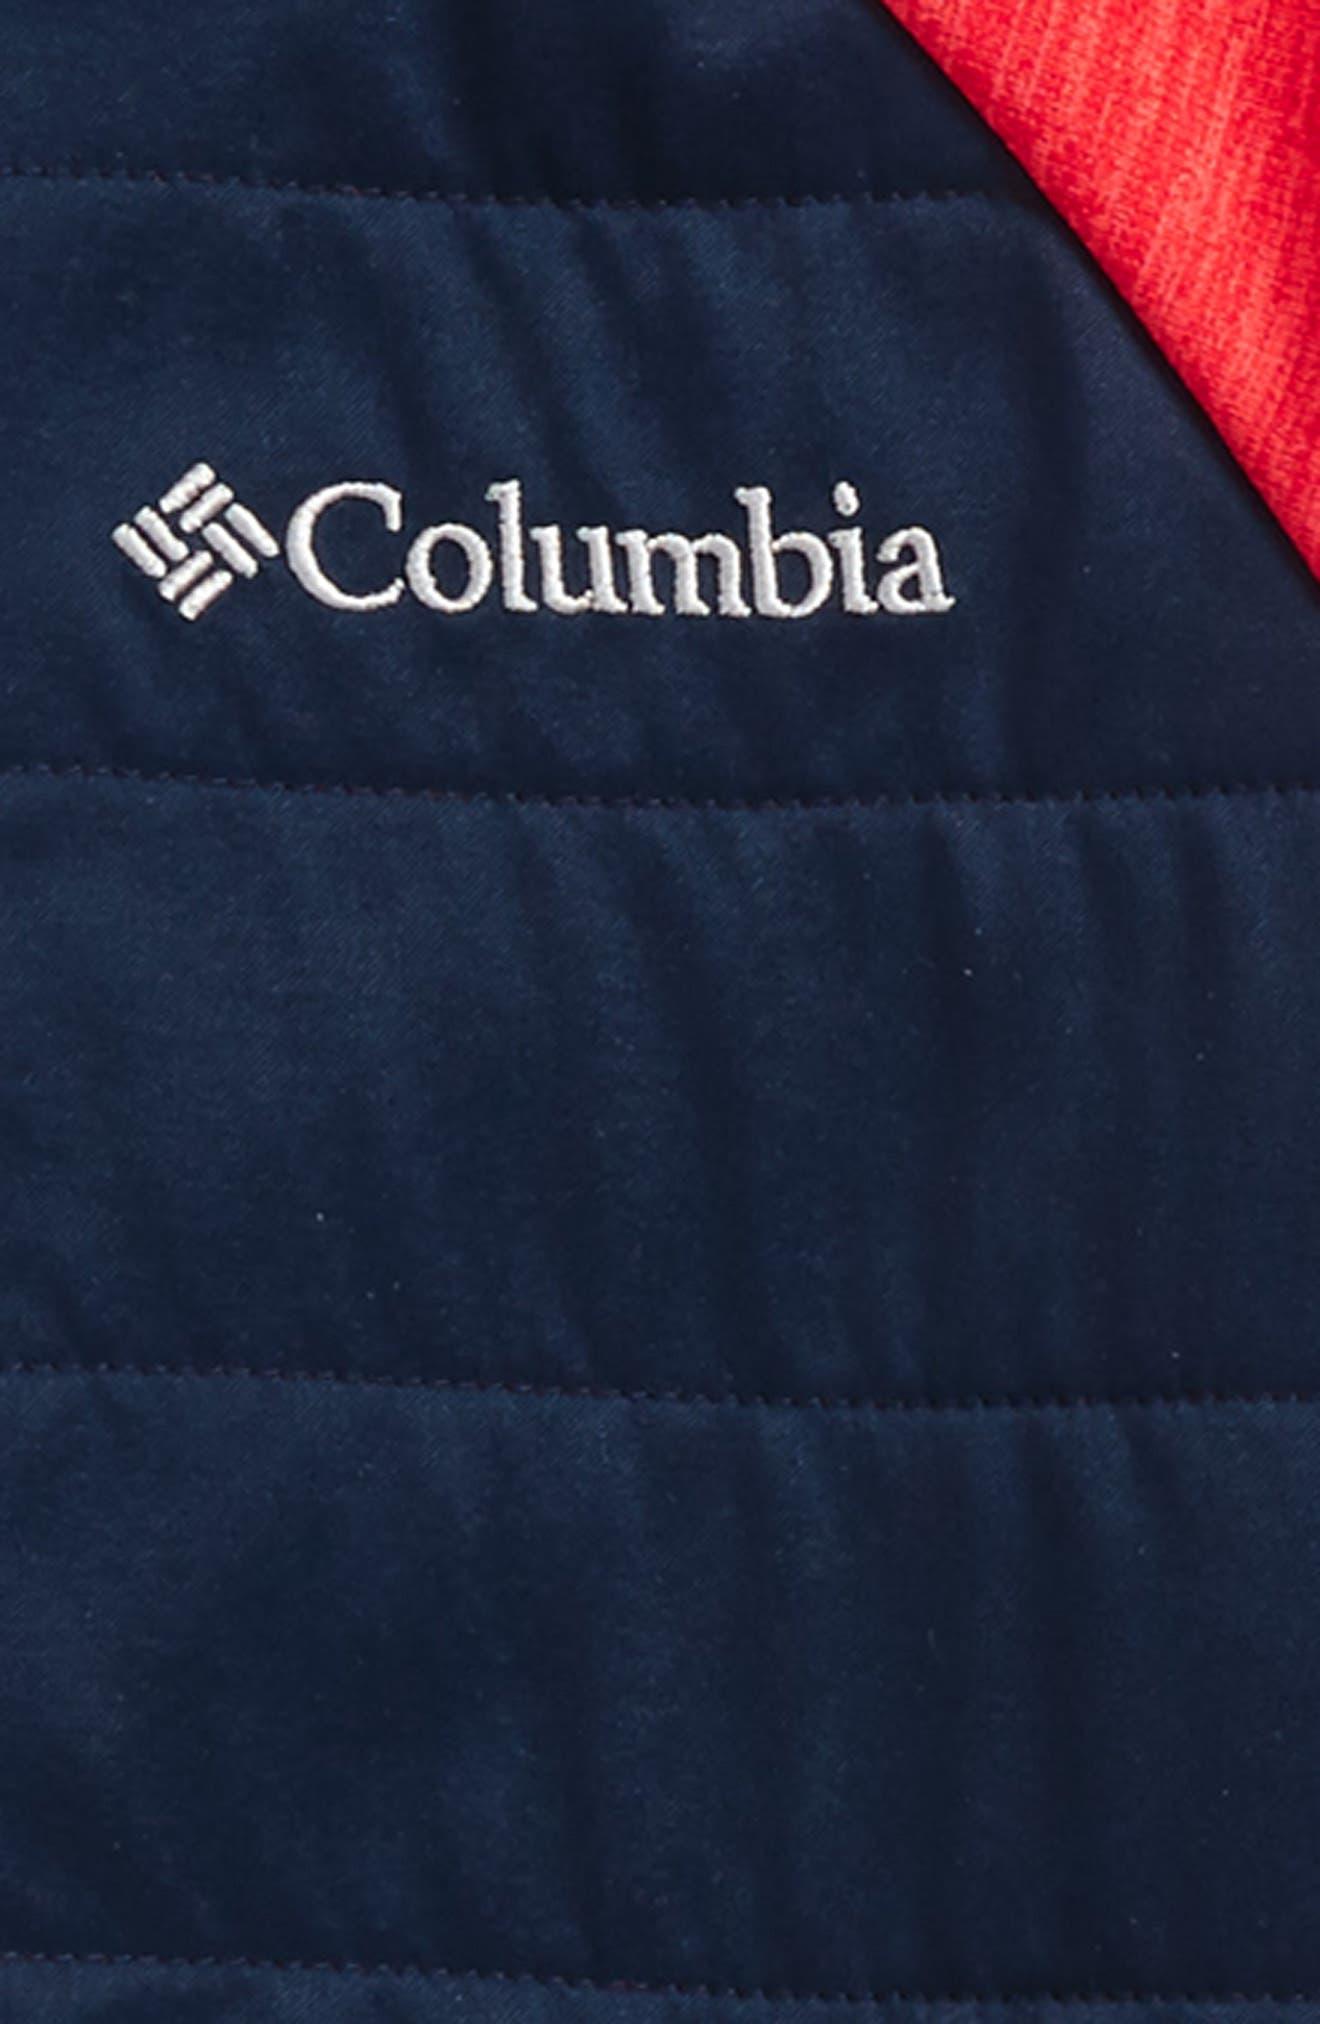 S'more Adventure Water Resistant Hybrid Hoodie,                             Alternate thumbnail 2, color,                             Red Heather/ Collegiate Navy